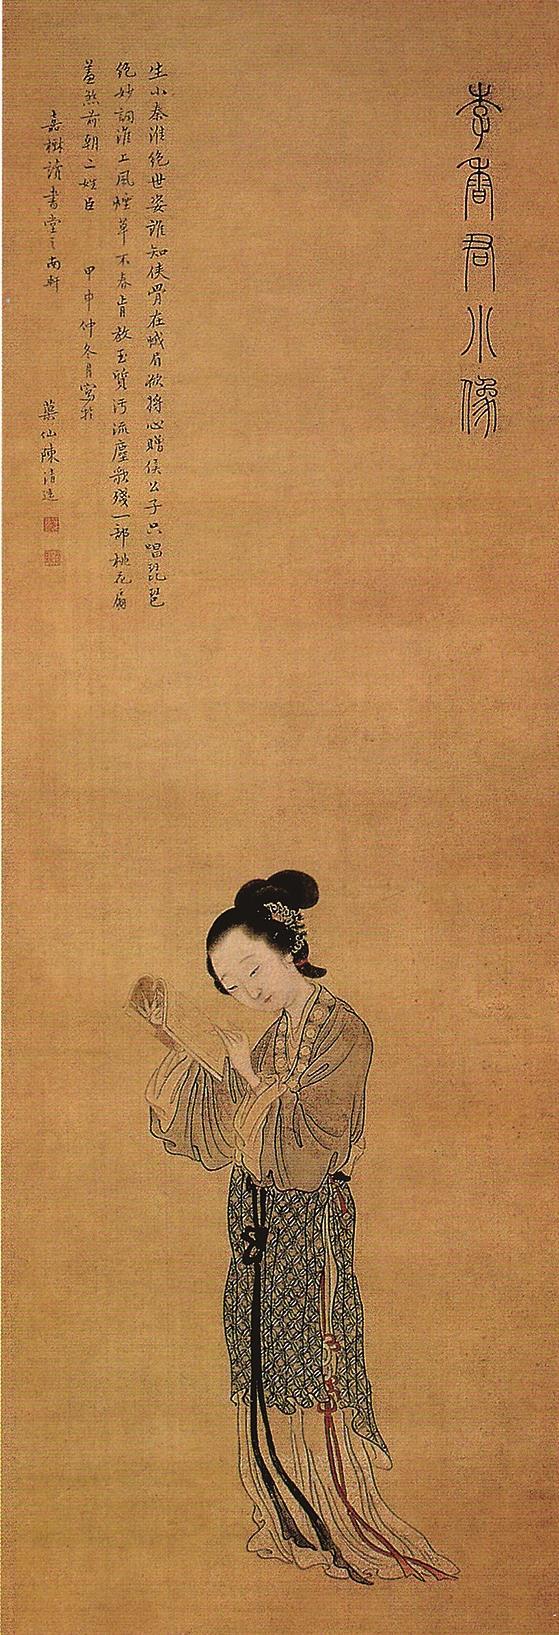 Tragic life of a Chinese beauty